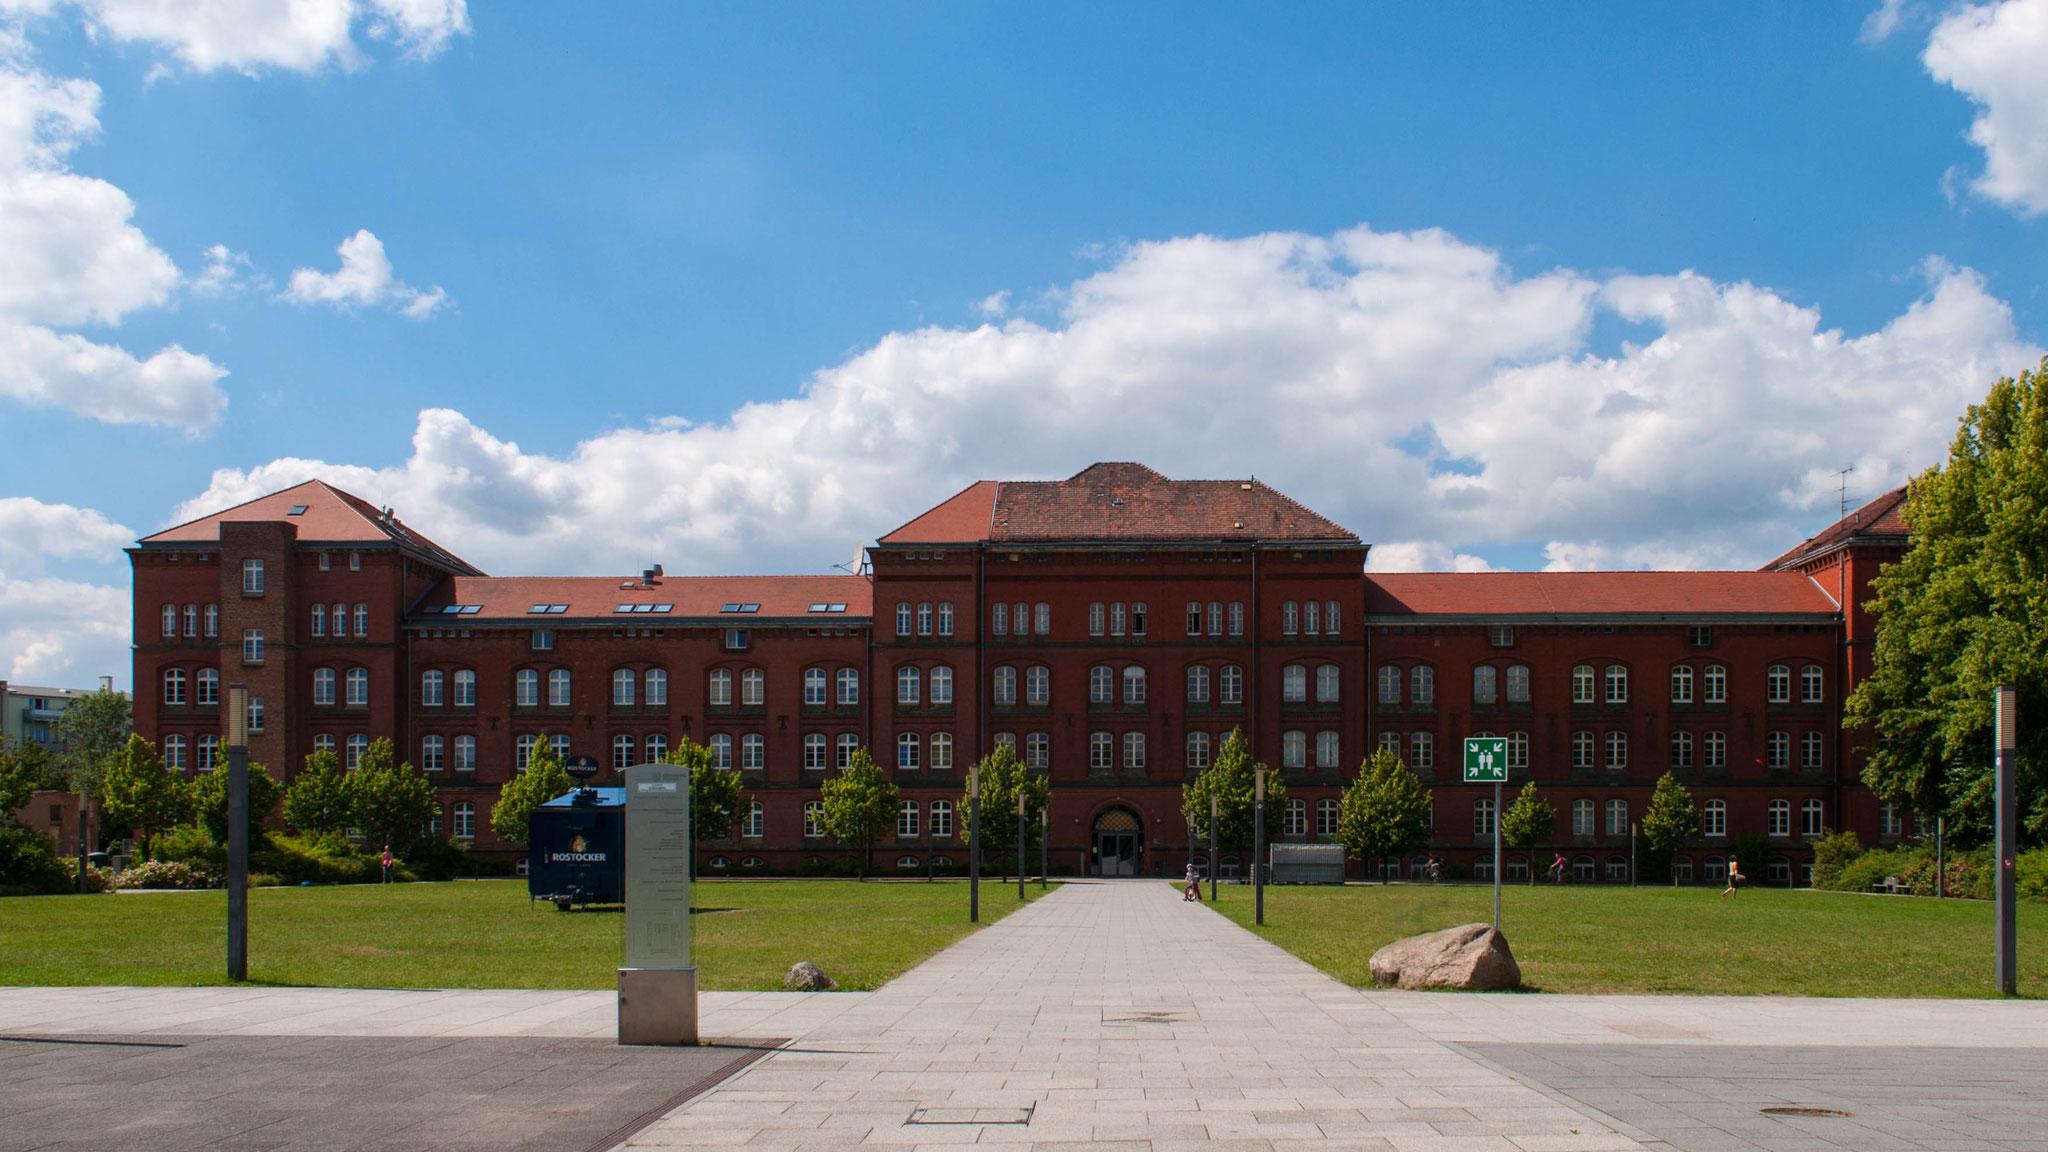 Universitätsgebäude in der Ulmenstraße.